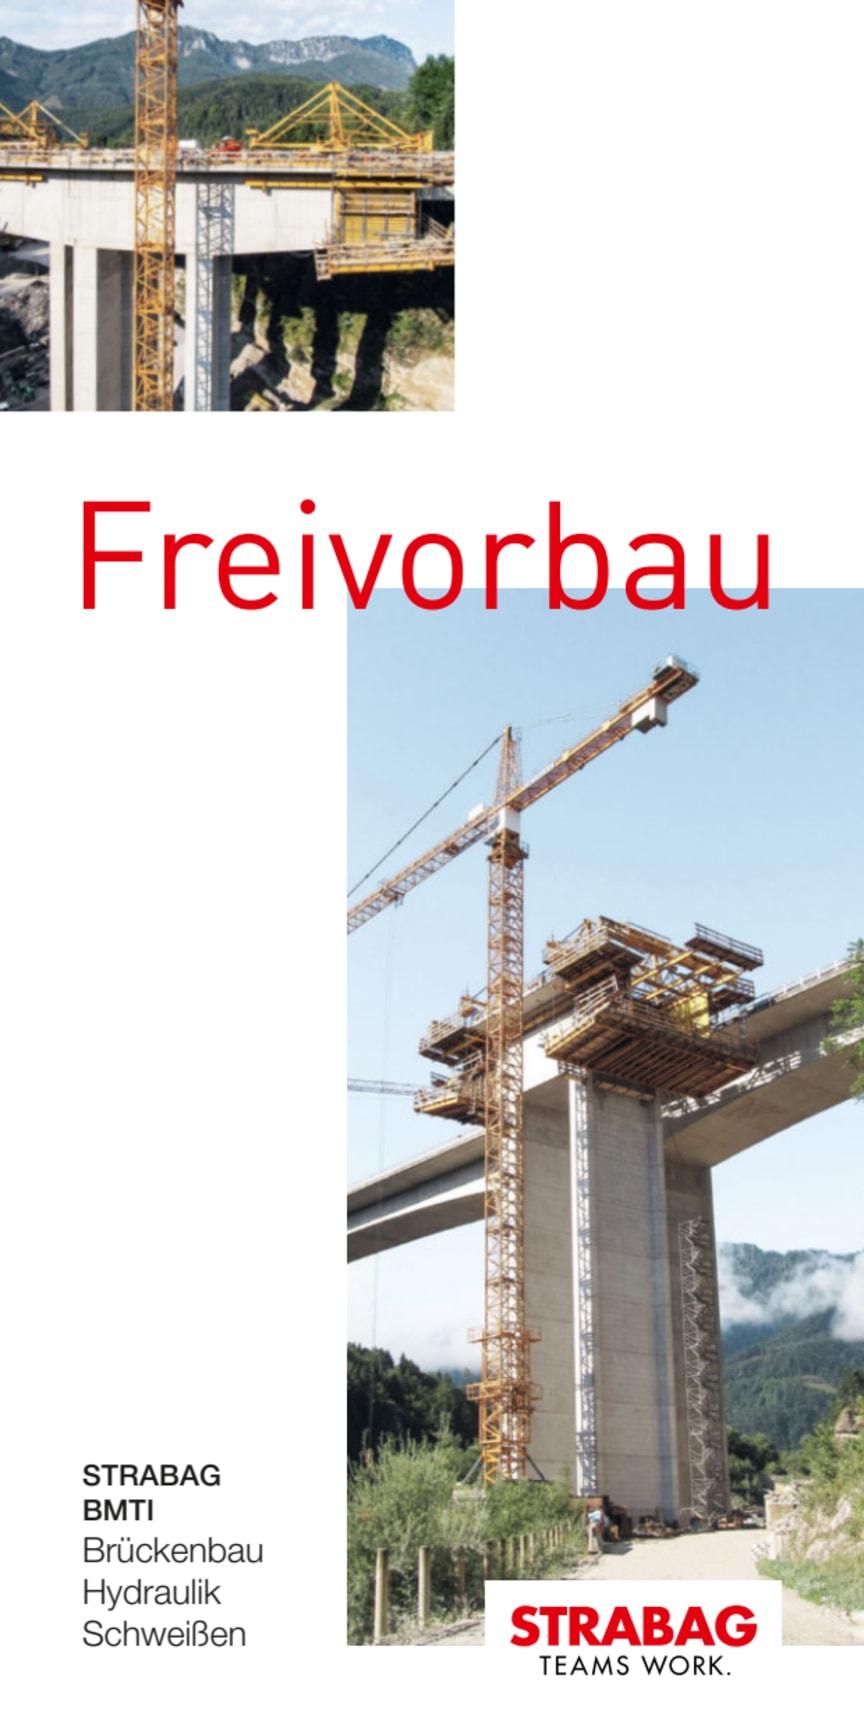 STRABAG BMTI: Brückenbau, Hydraulik, Schweißen